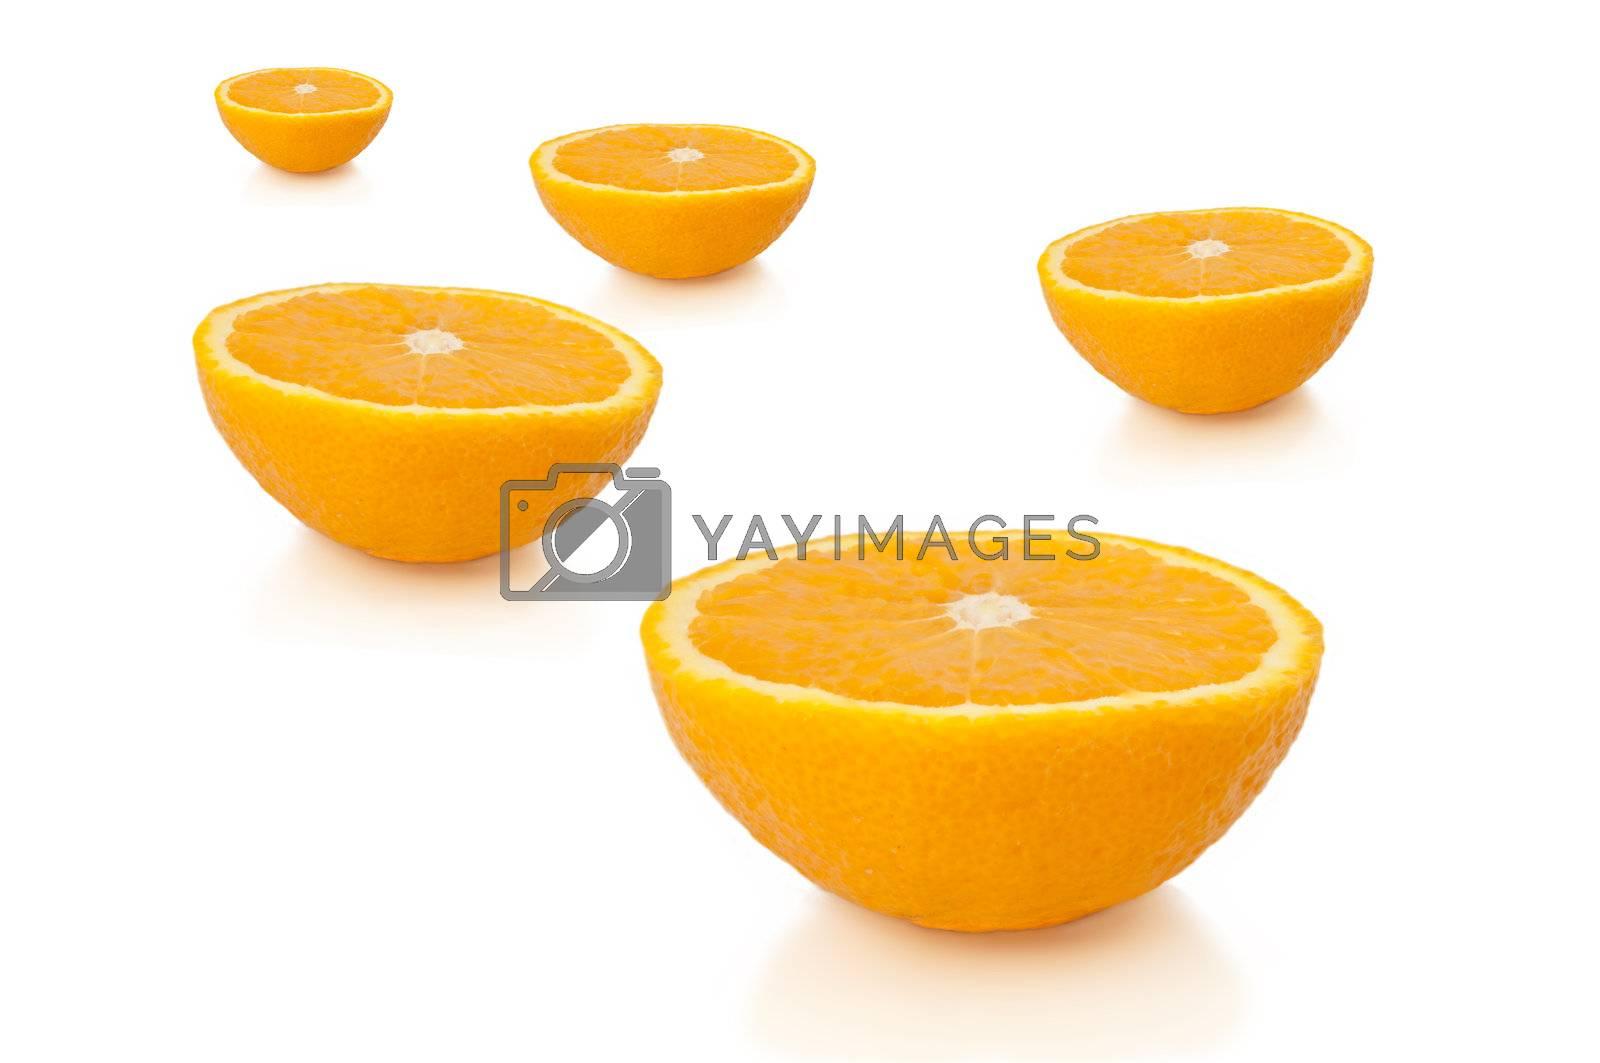 FIve freshly cut orange halves arranged over white.